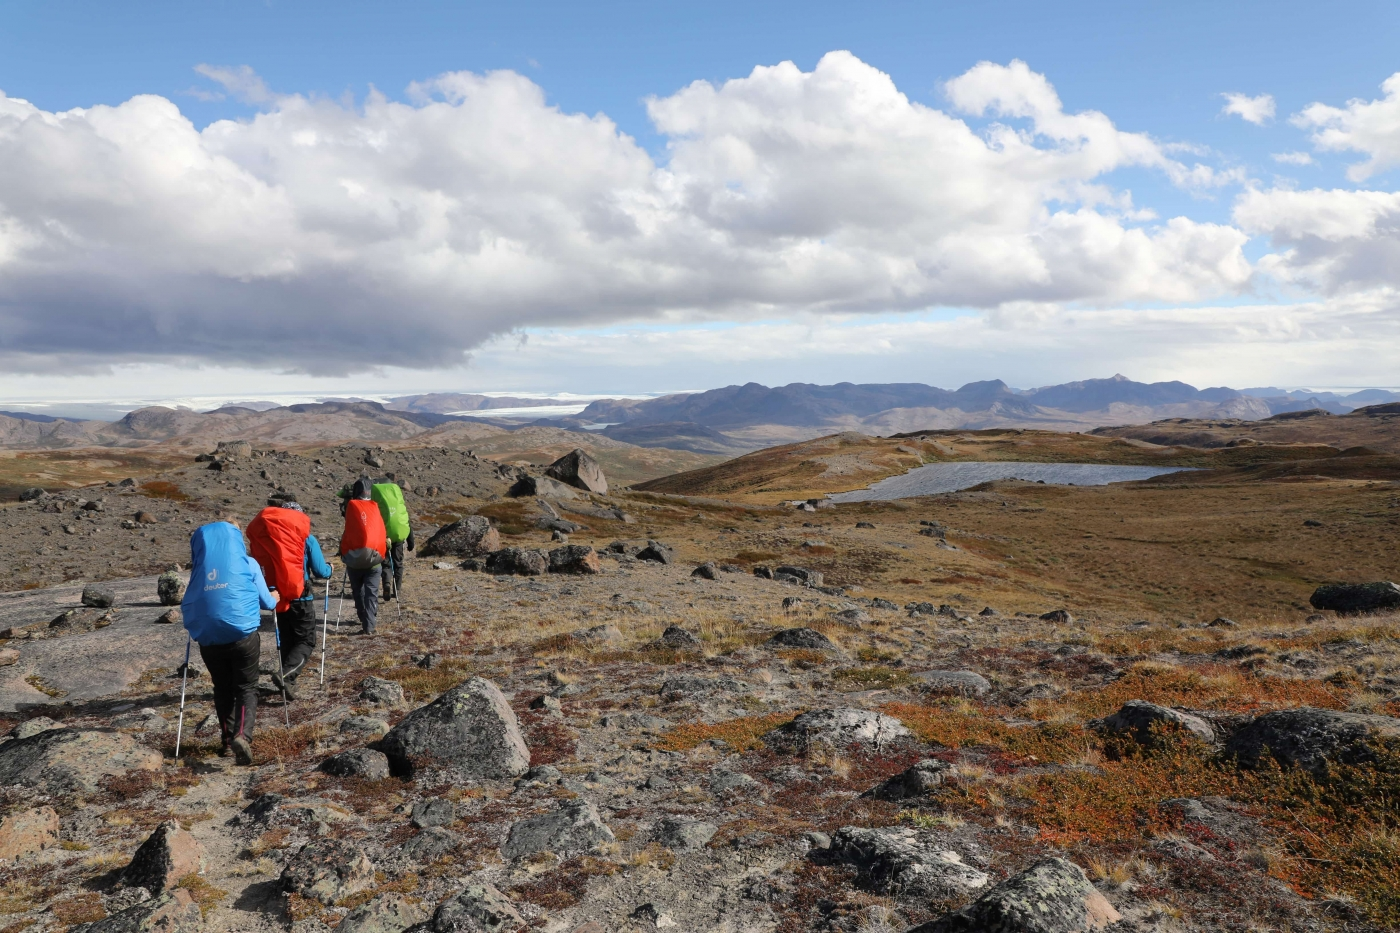 Hikers hiking in Aasivissuit UNESCO area close to Kangerlussuaq in summer. Photo by Morten Christensen